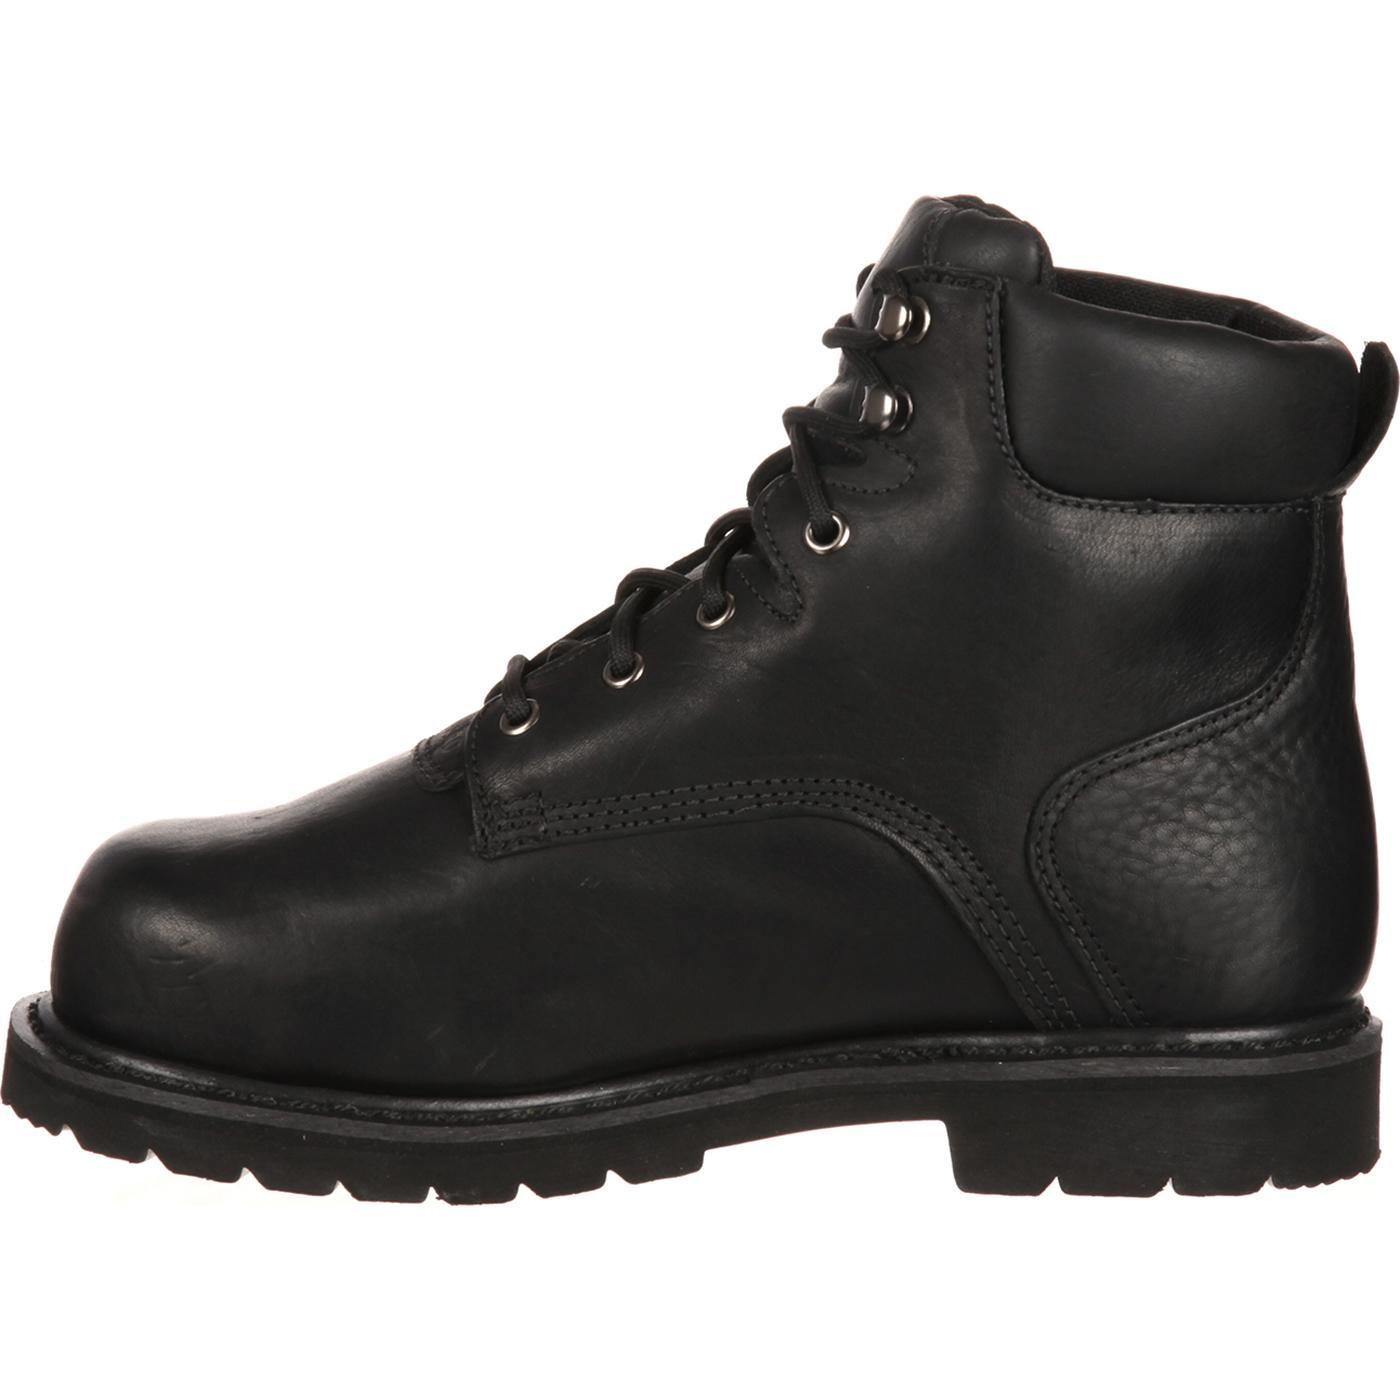 Lehigh Unisex Steel Toe Met Guard Waterproof Work Boots